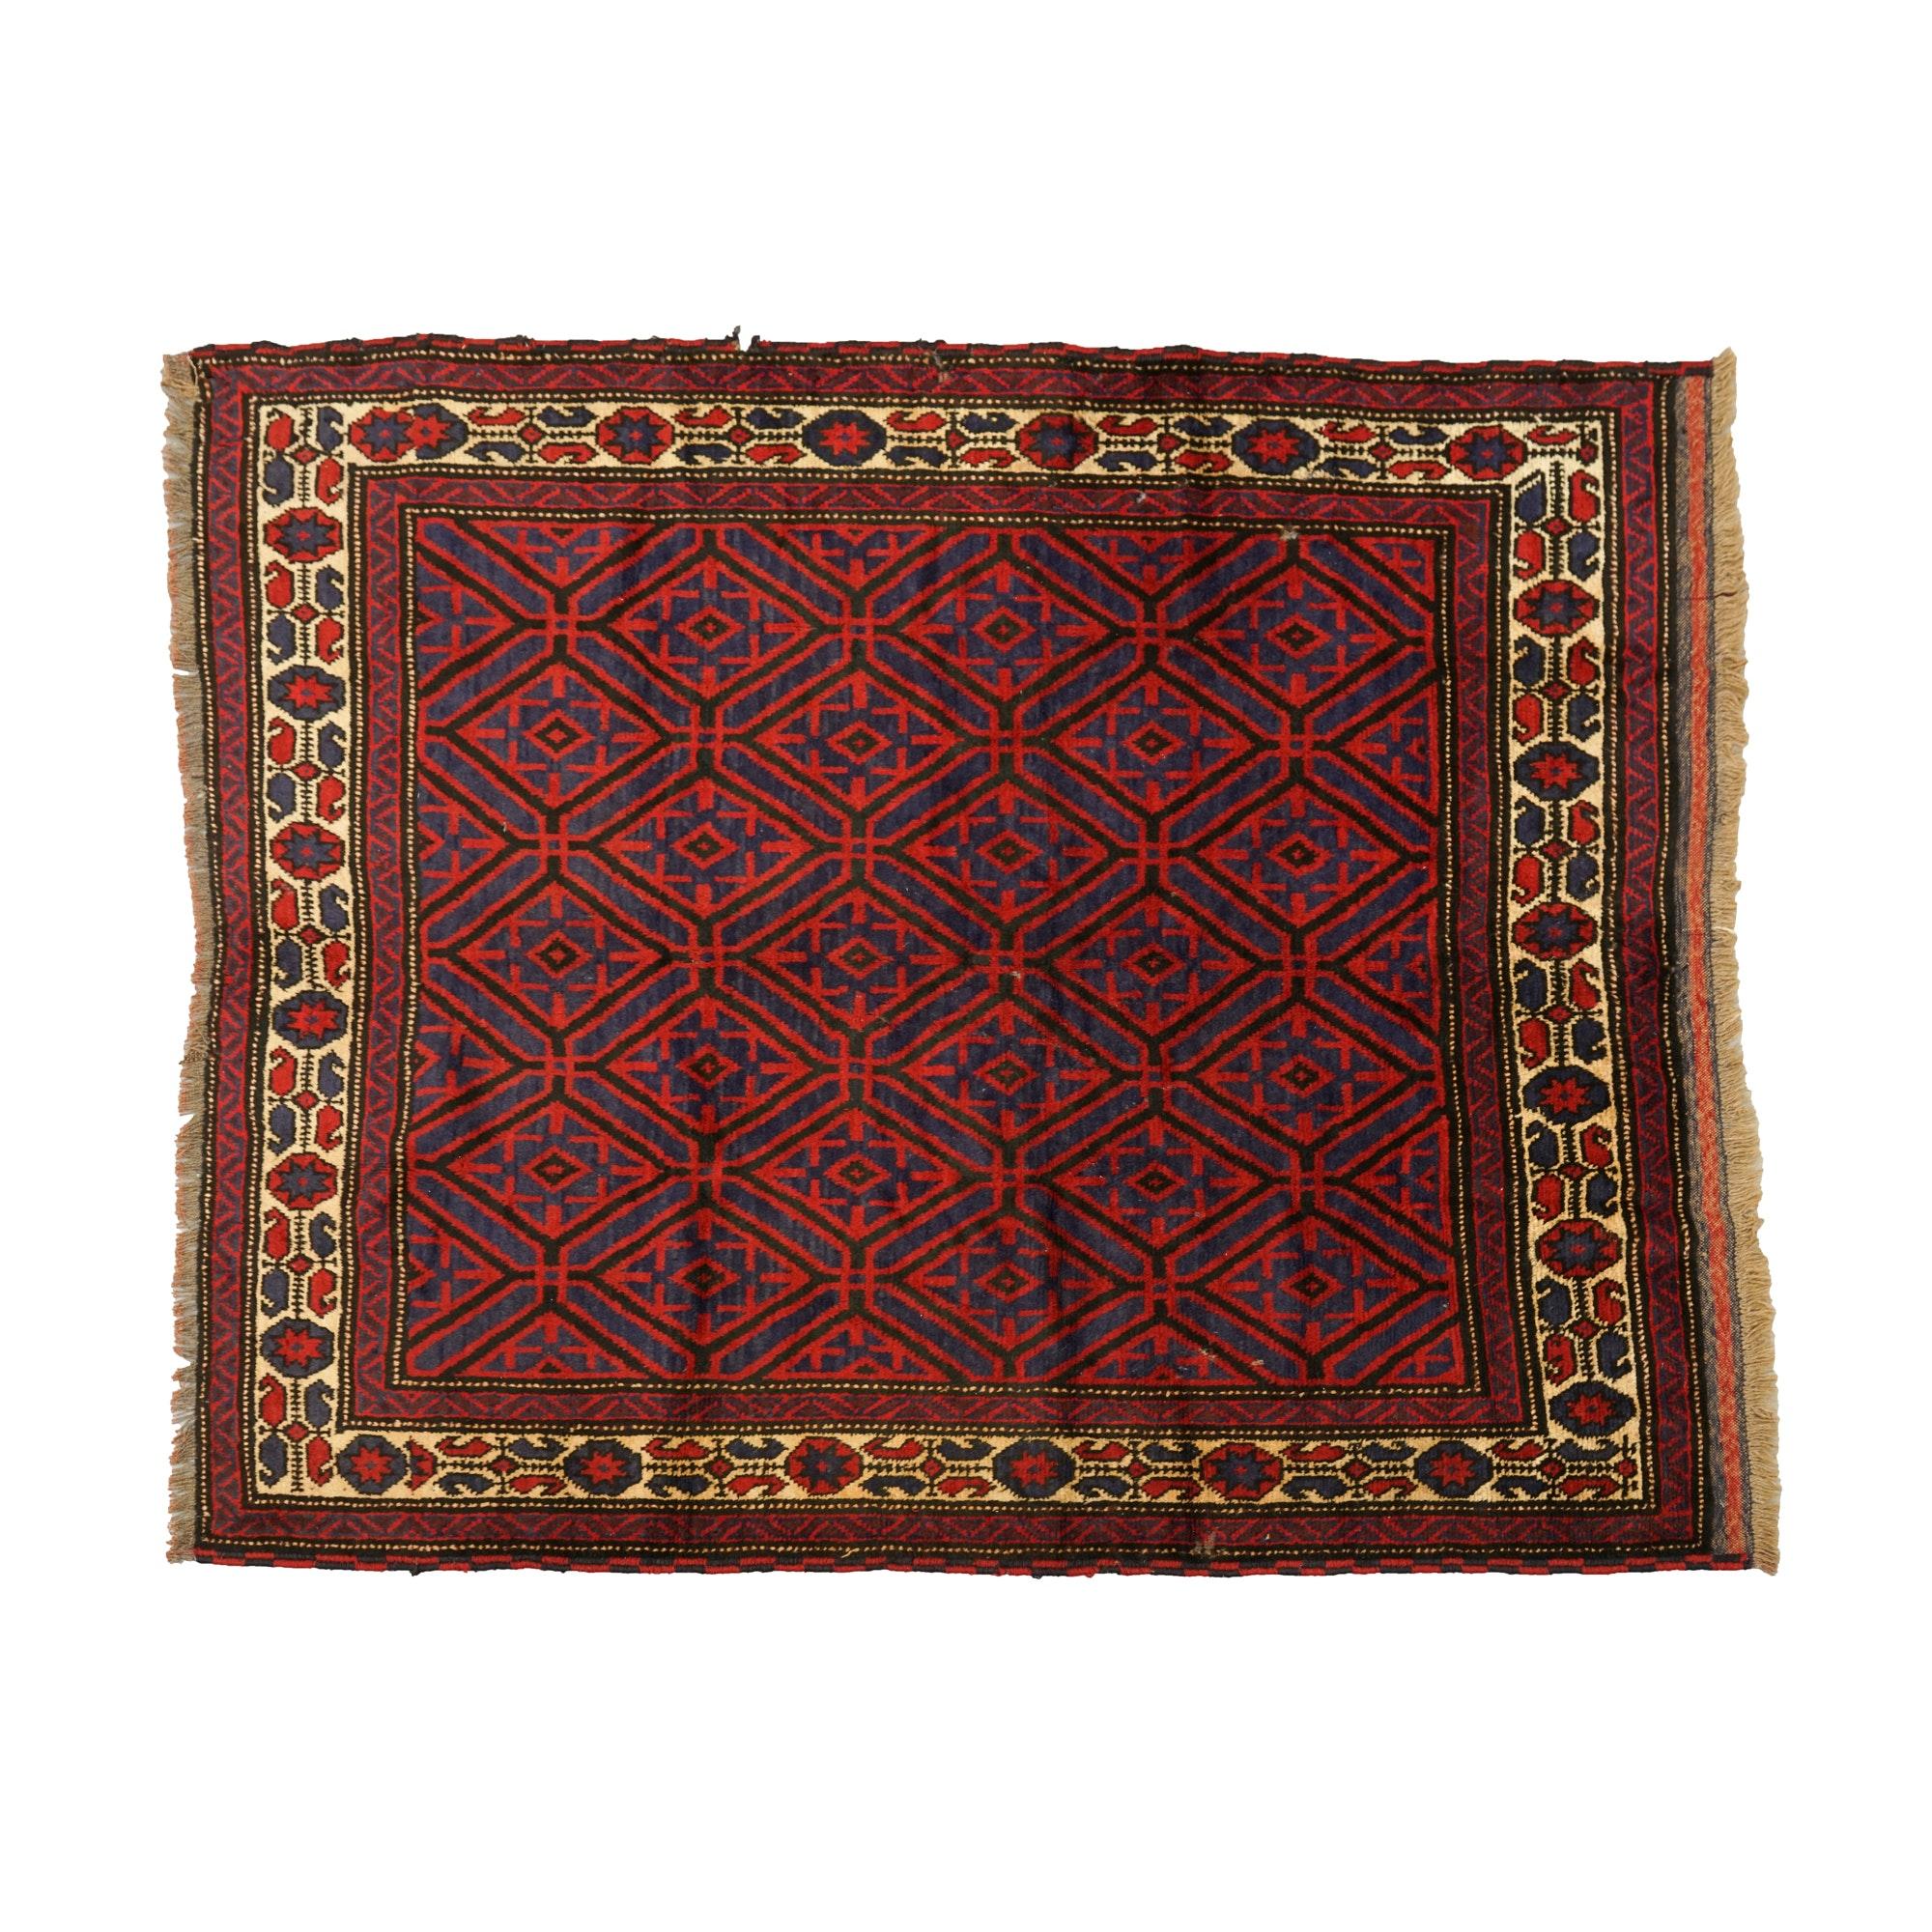 Hand-Knotted Baluch Mashwani Area Rug